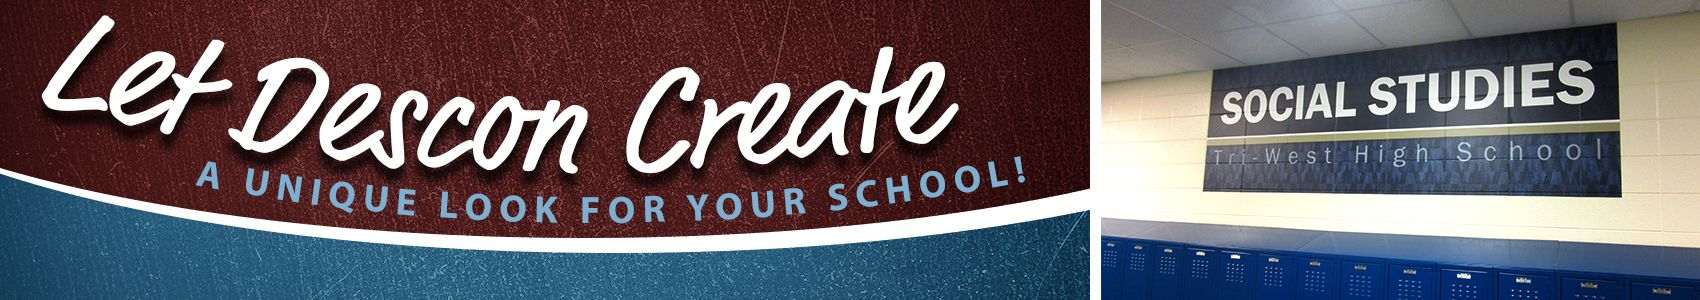 School wall graphics example, hallway example above lockers, custom graphics signage company